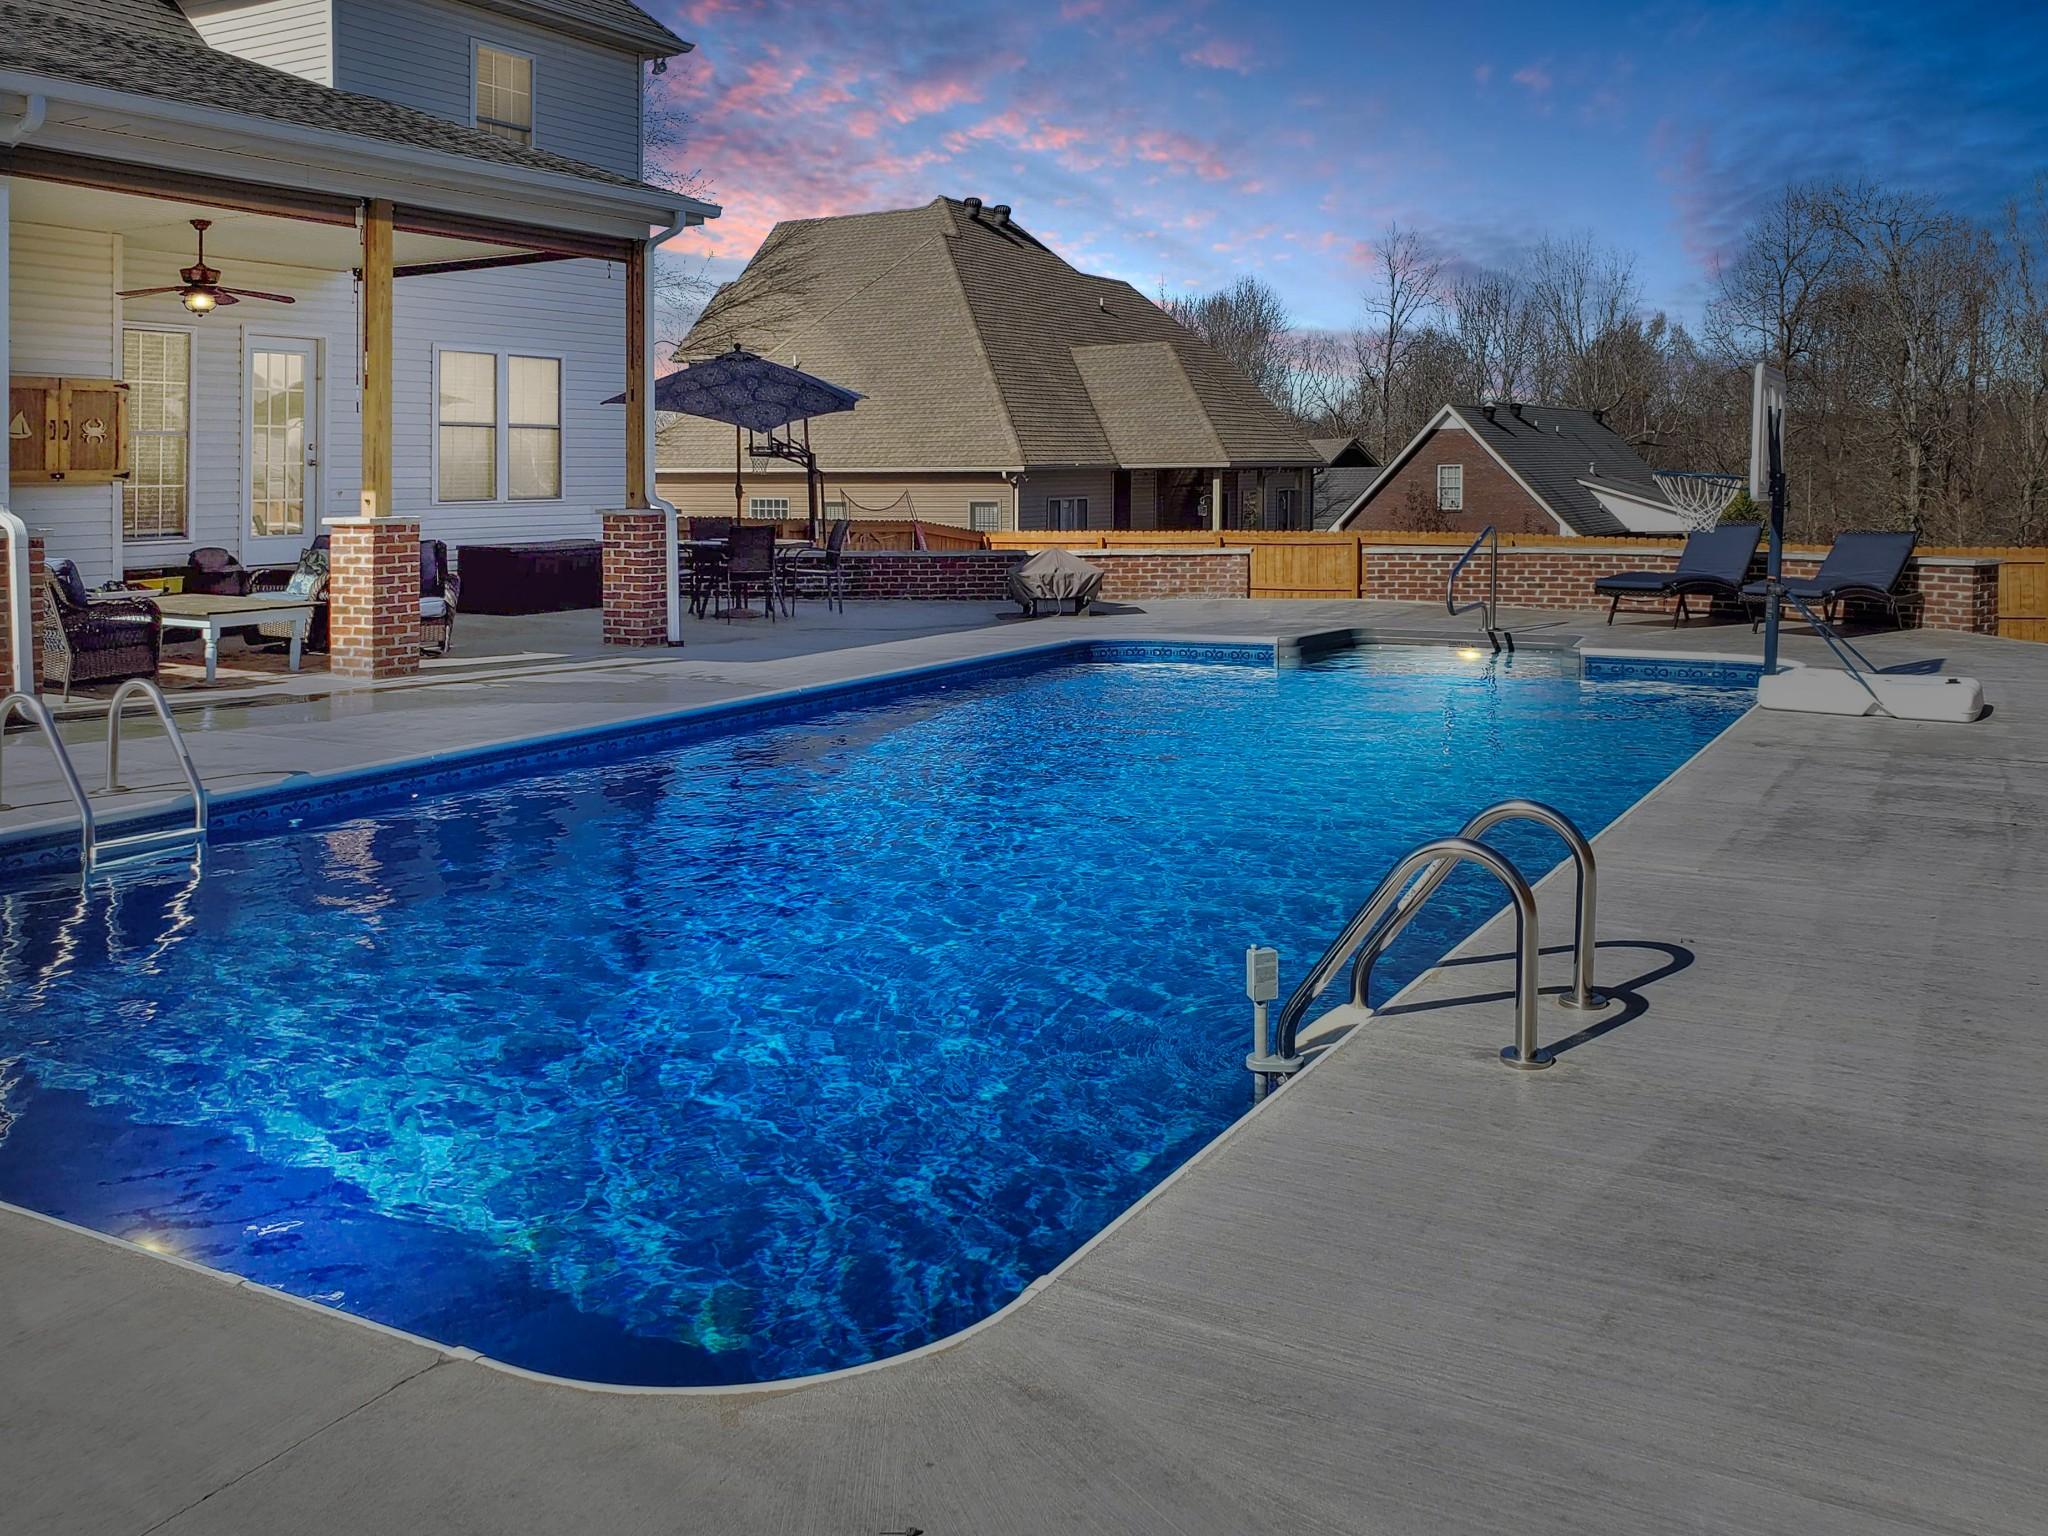 1145 Winding Creek Ct, Clarksville, TN 37043 - Clarksville, TN real estate listing